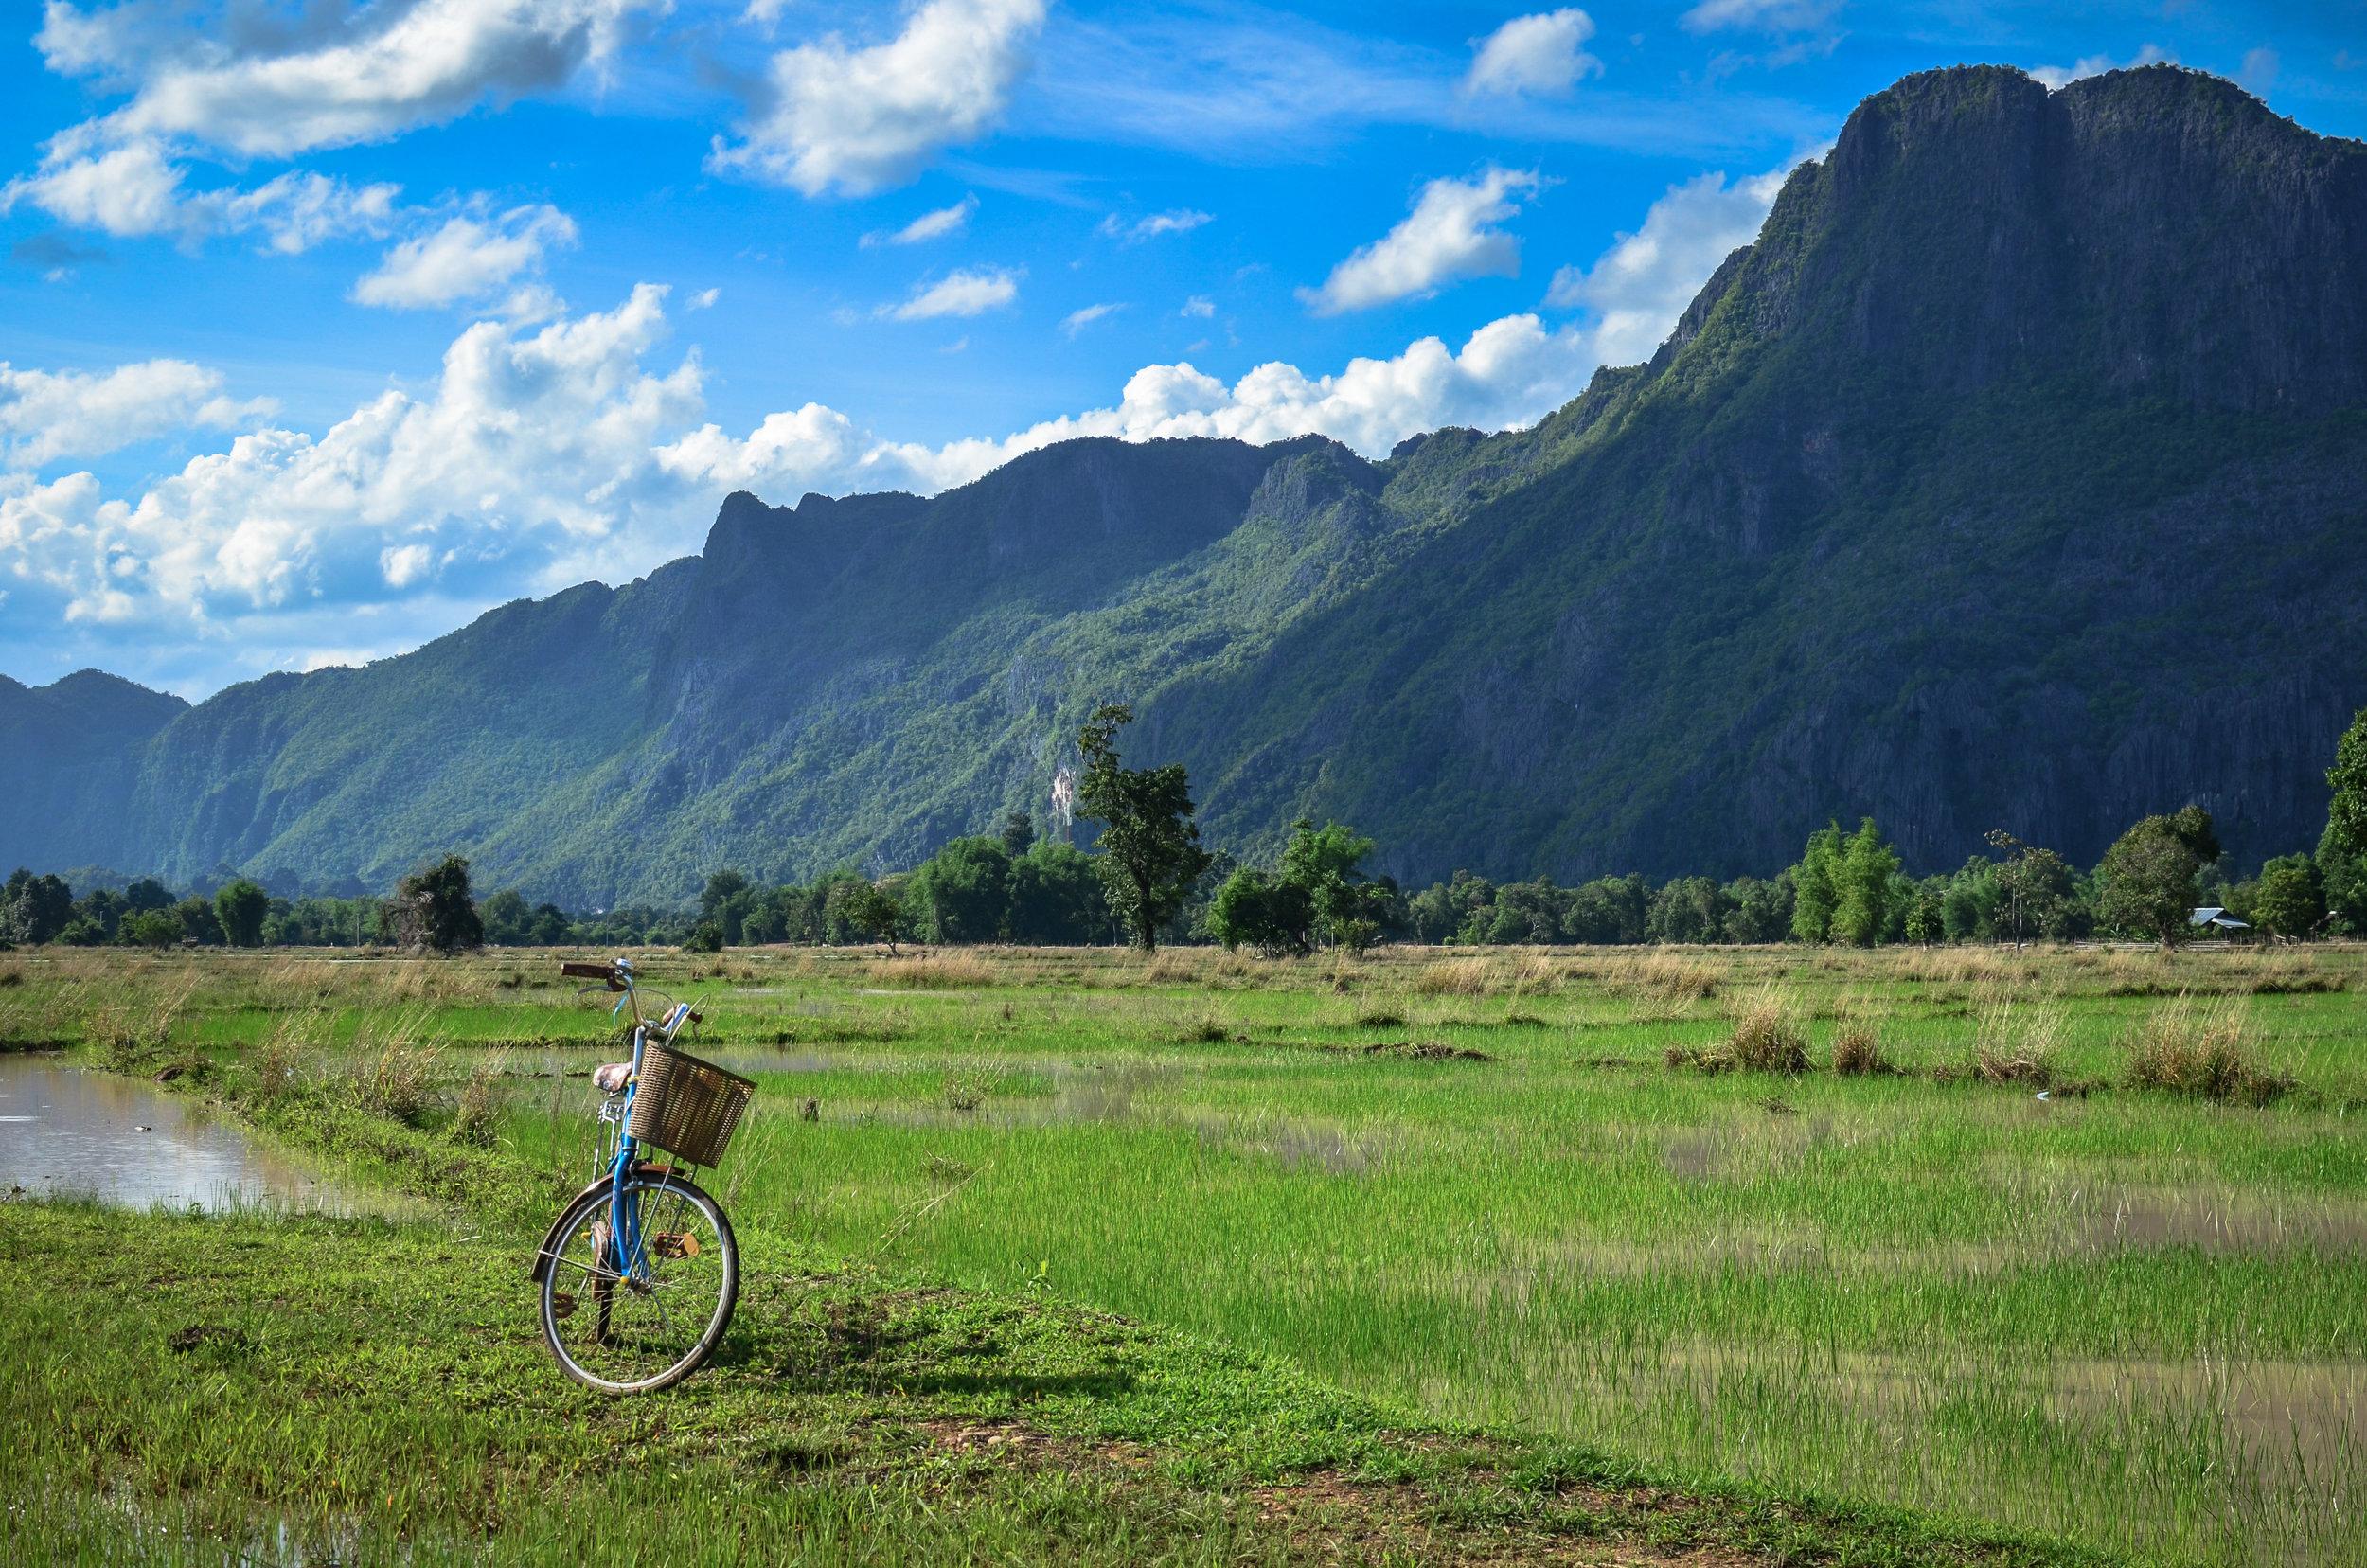 Bicycle in Ban Lao, Laos